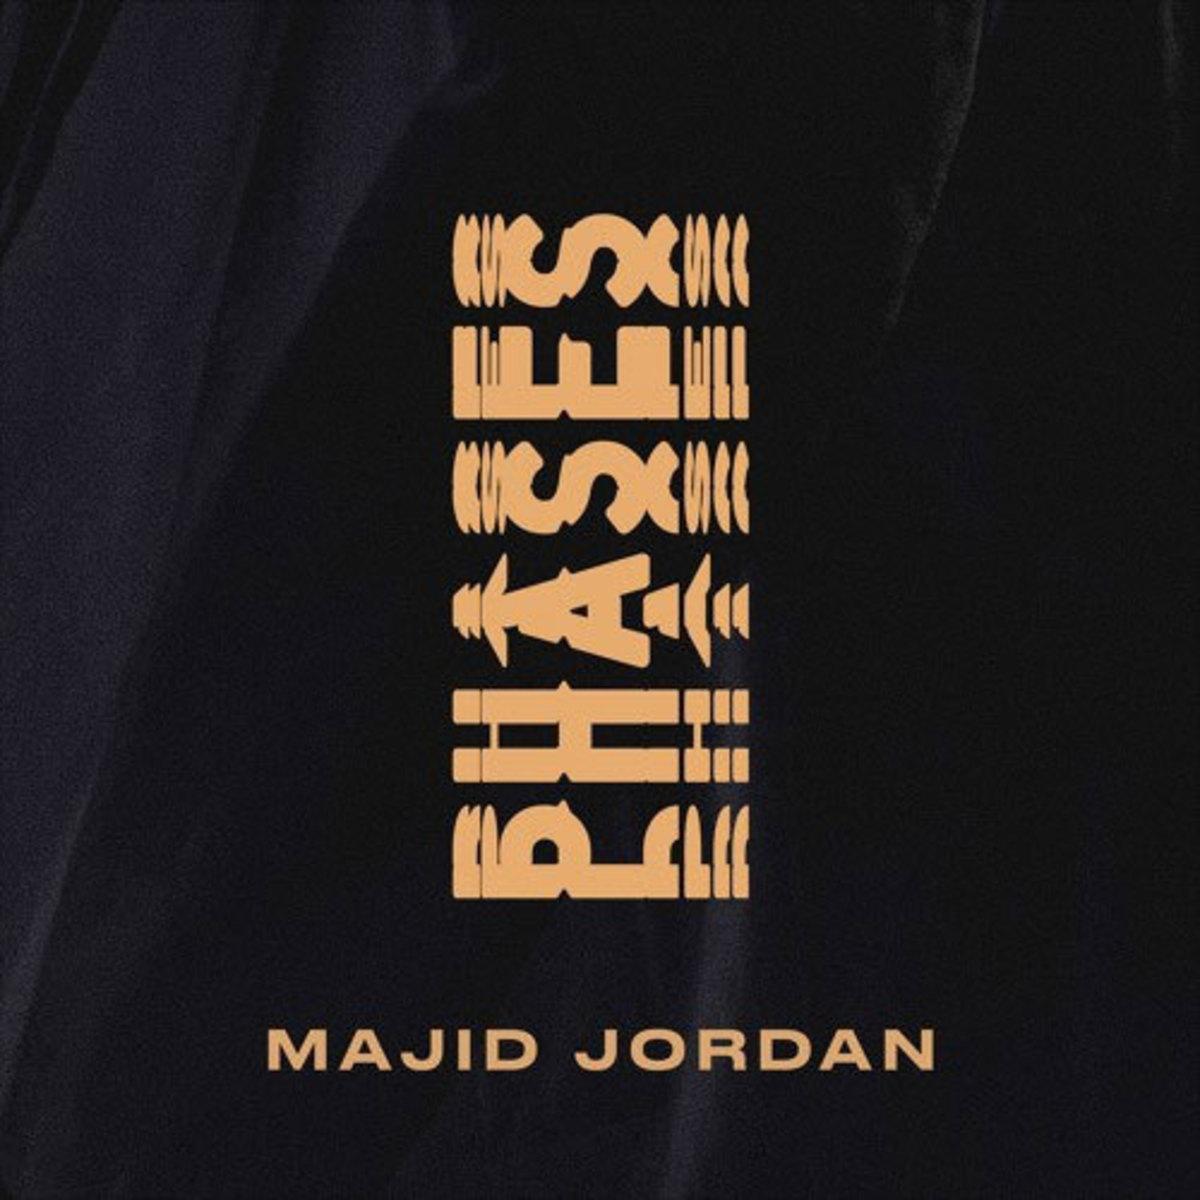 majid-jordan-phases.jpg